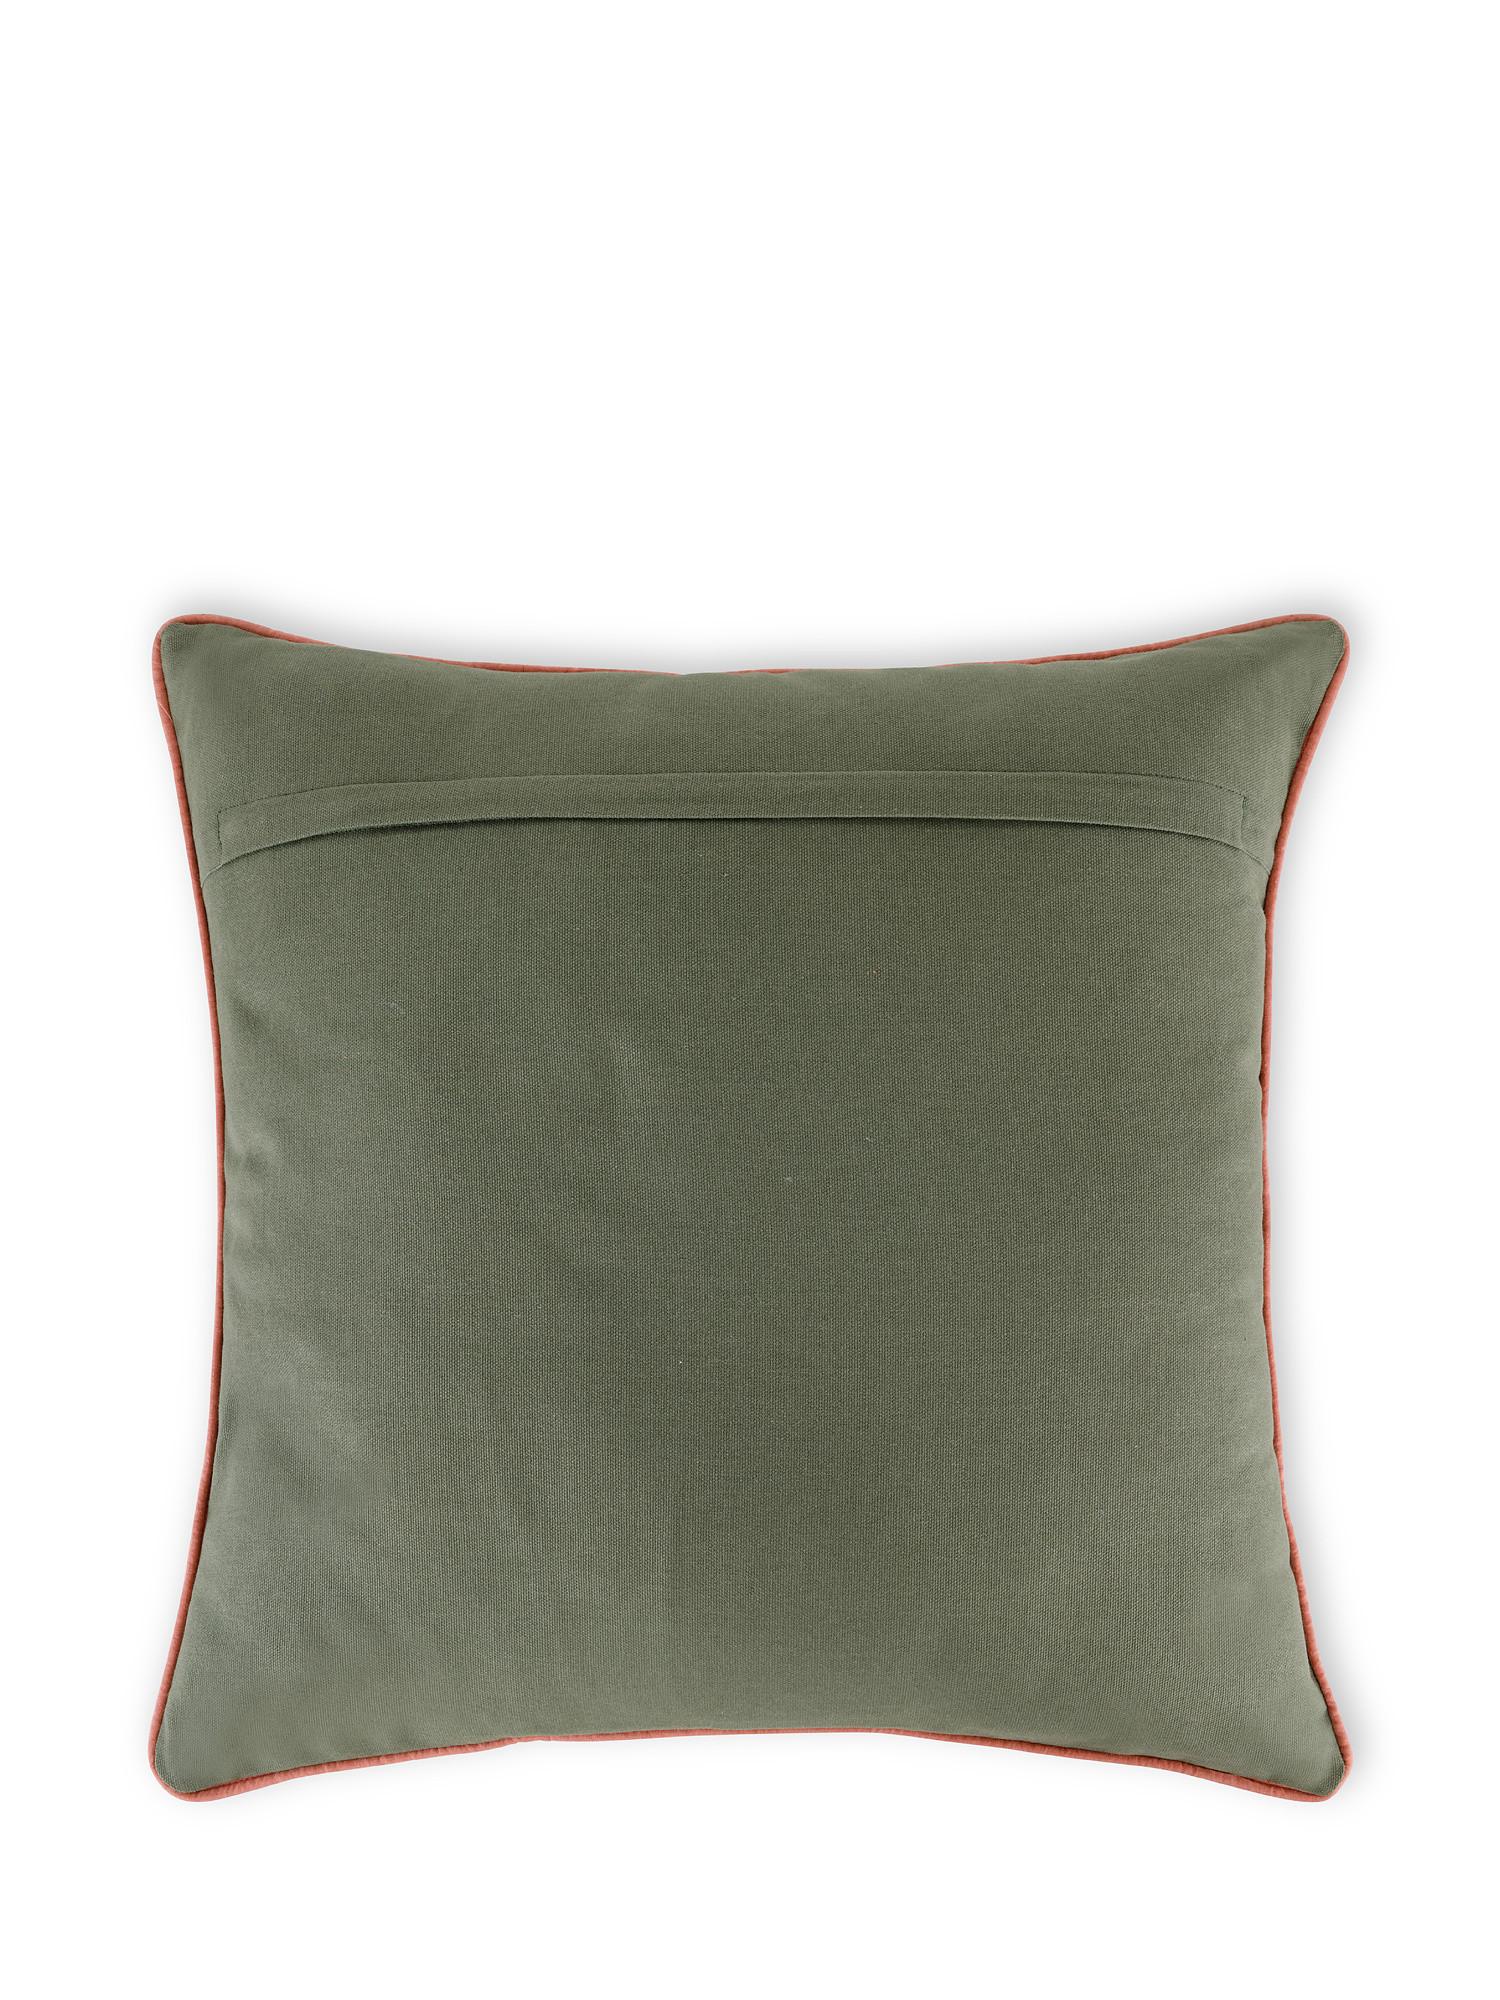 Cuscino cotone ricamo ramage 45x45cm, Multicolor, large image number 1